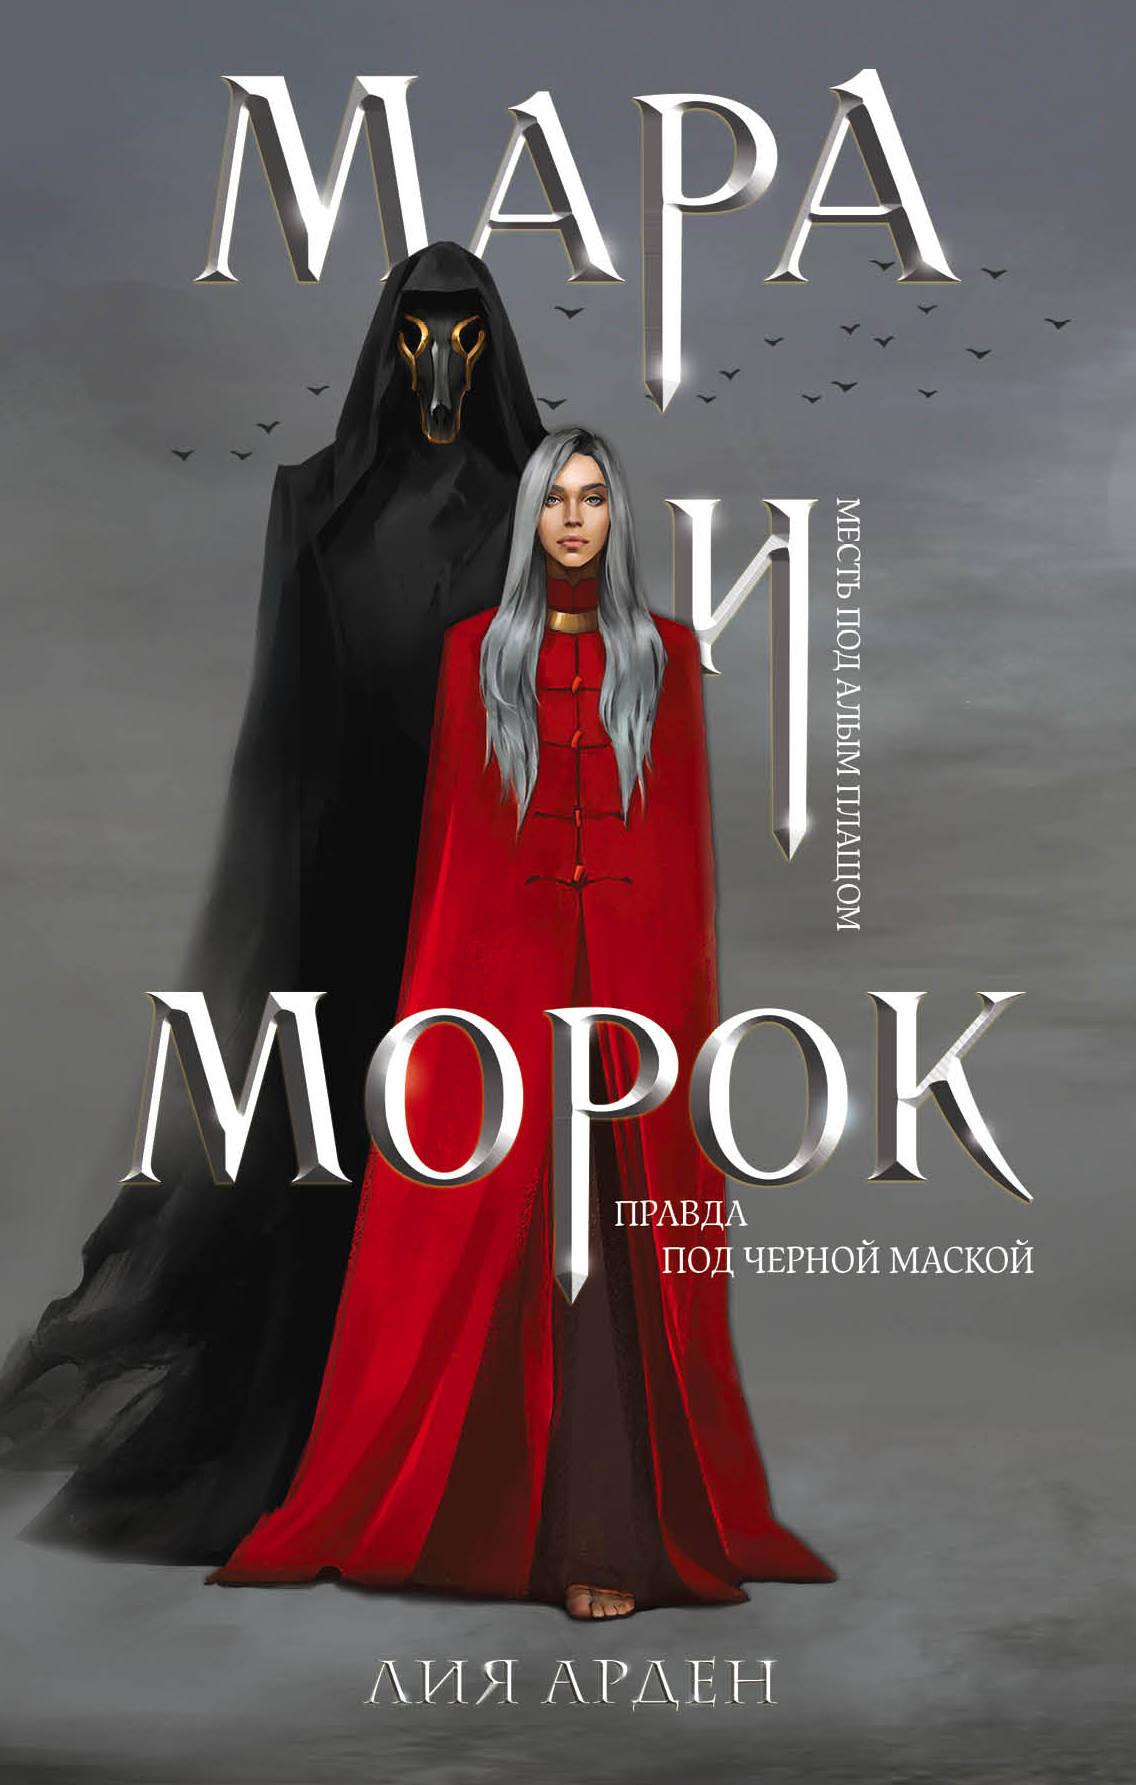 Mara i Morok